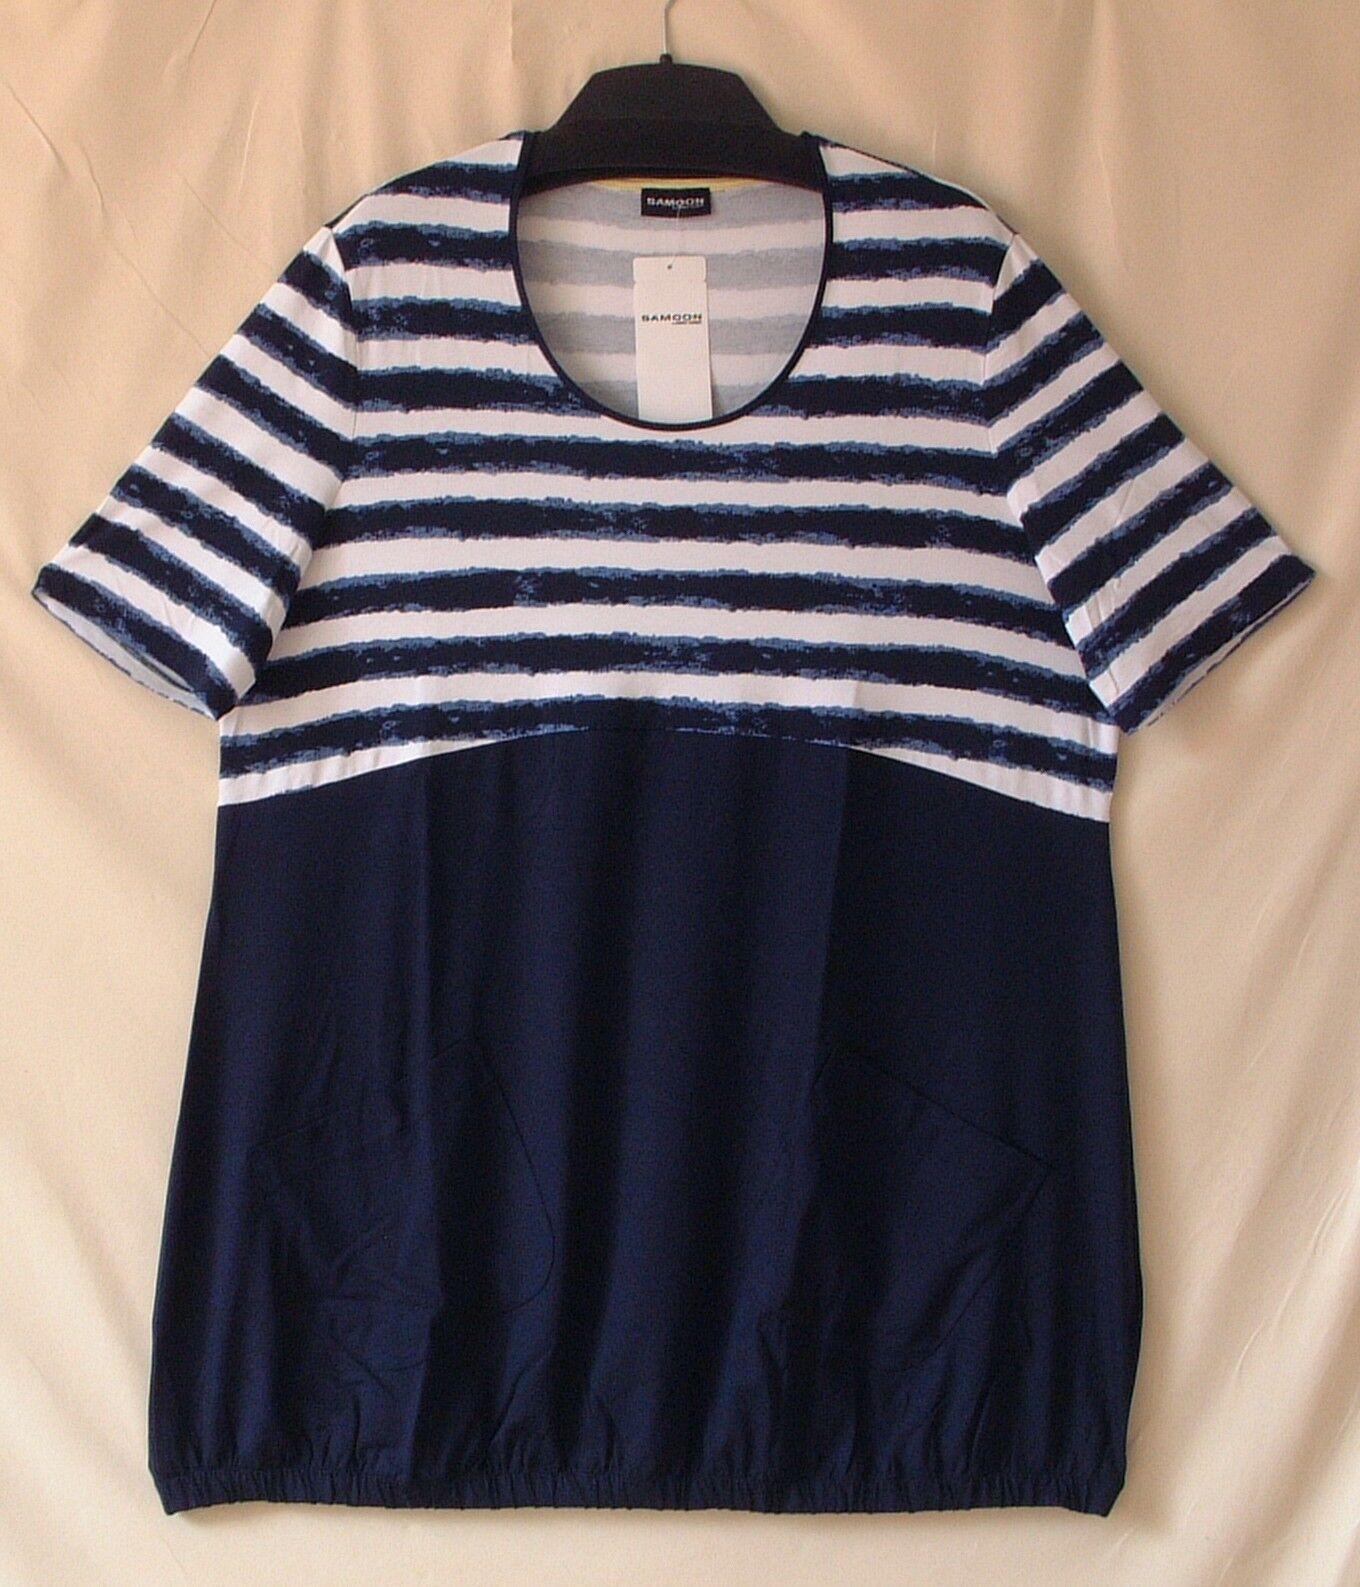 SAMOON Longstyle-shirt court Robe by Gerry Weber viscose stretch damen NEUF Größe 50